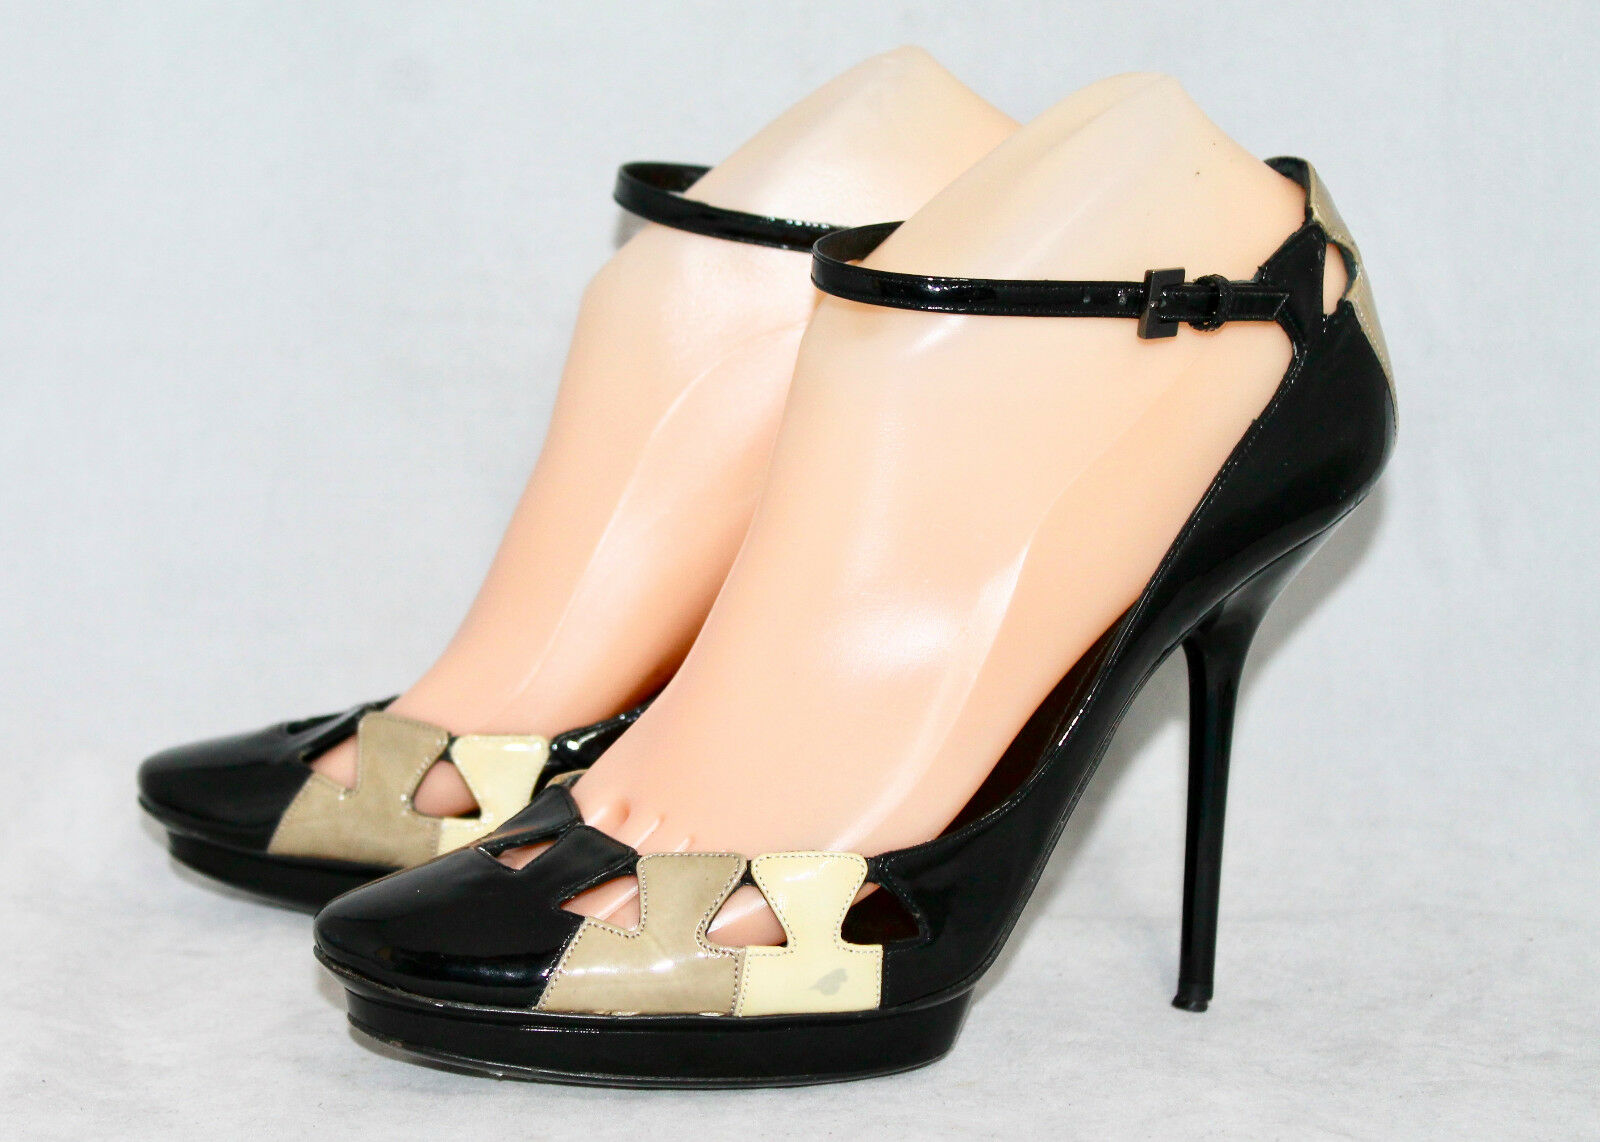 GIORGIO ARMANI Wo's 6.5 Eu 37 Black Taupe Beige Patent Stiletto Heel Dress shoes